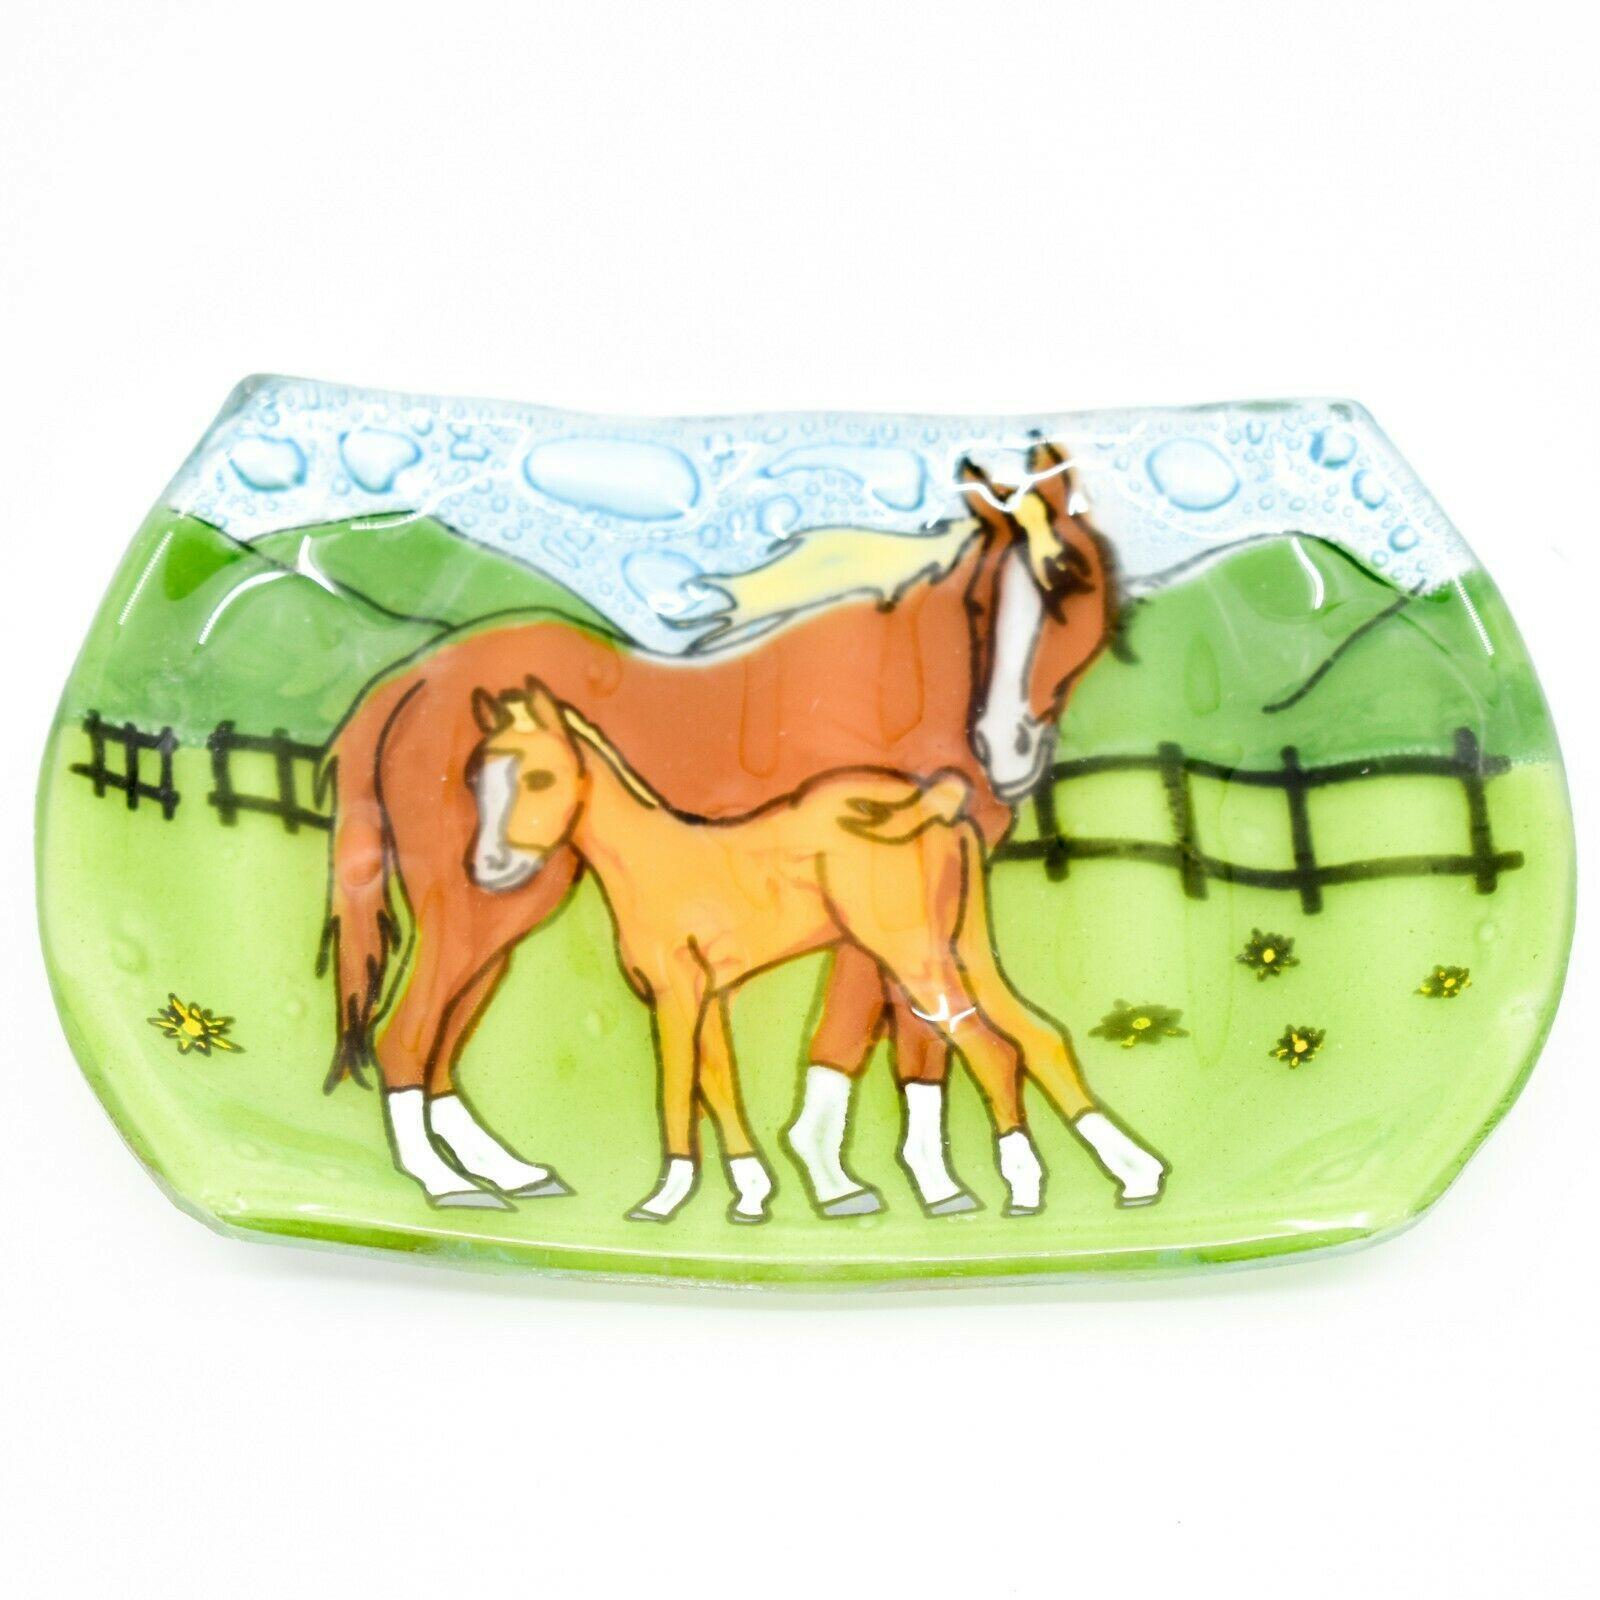 Fused Art Glass Mare & Foal Horse Farm Floral Design Soap Dish Handmade Ecuador